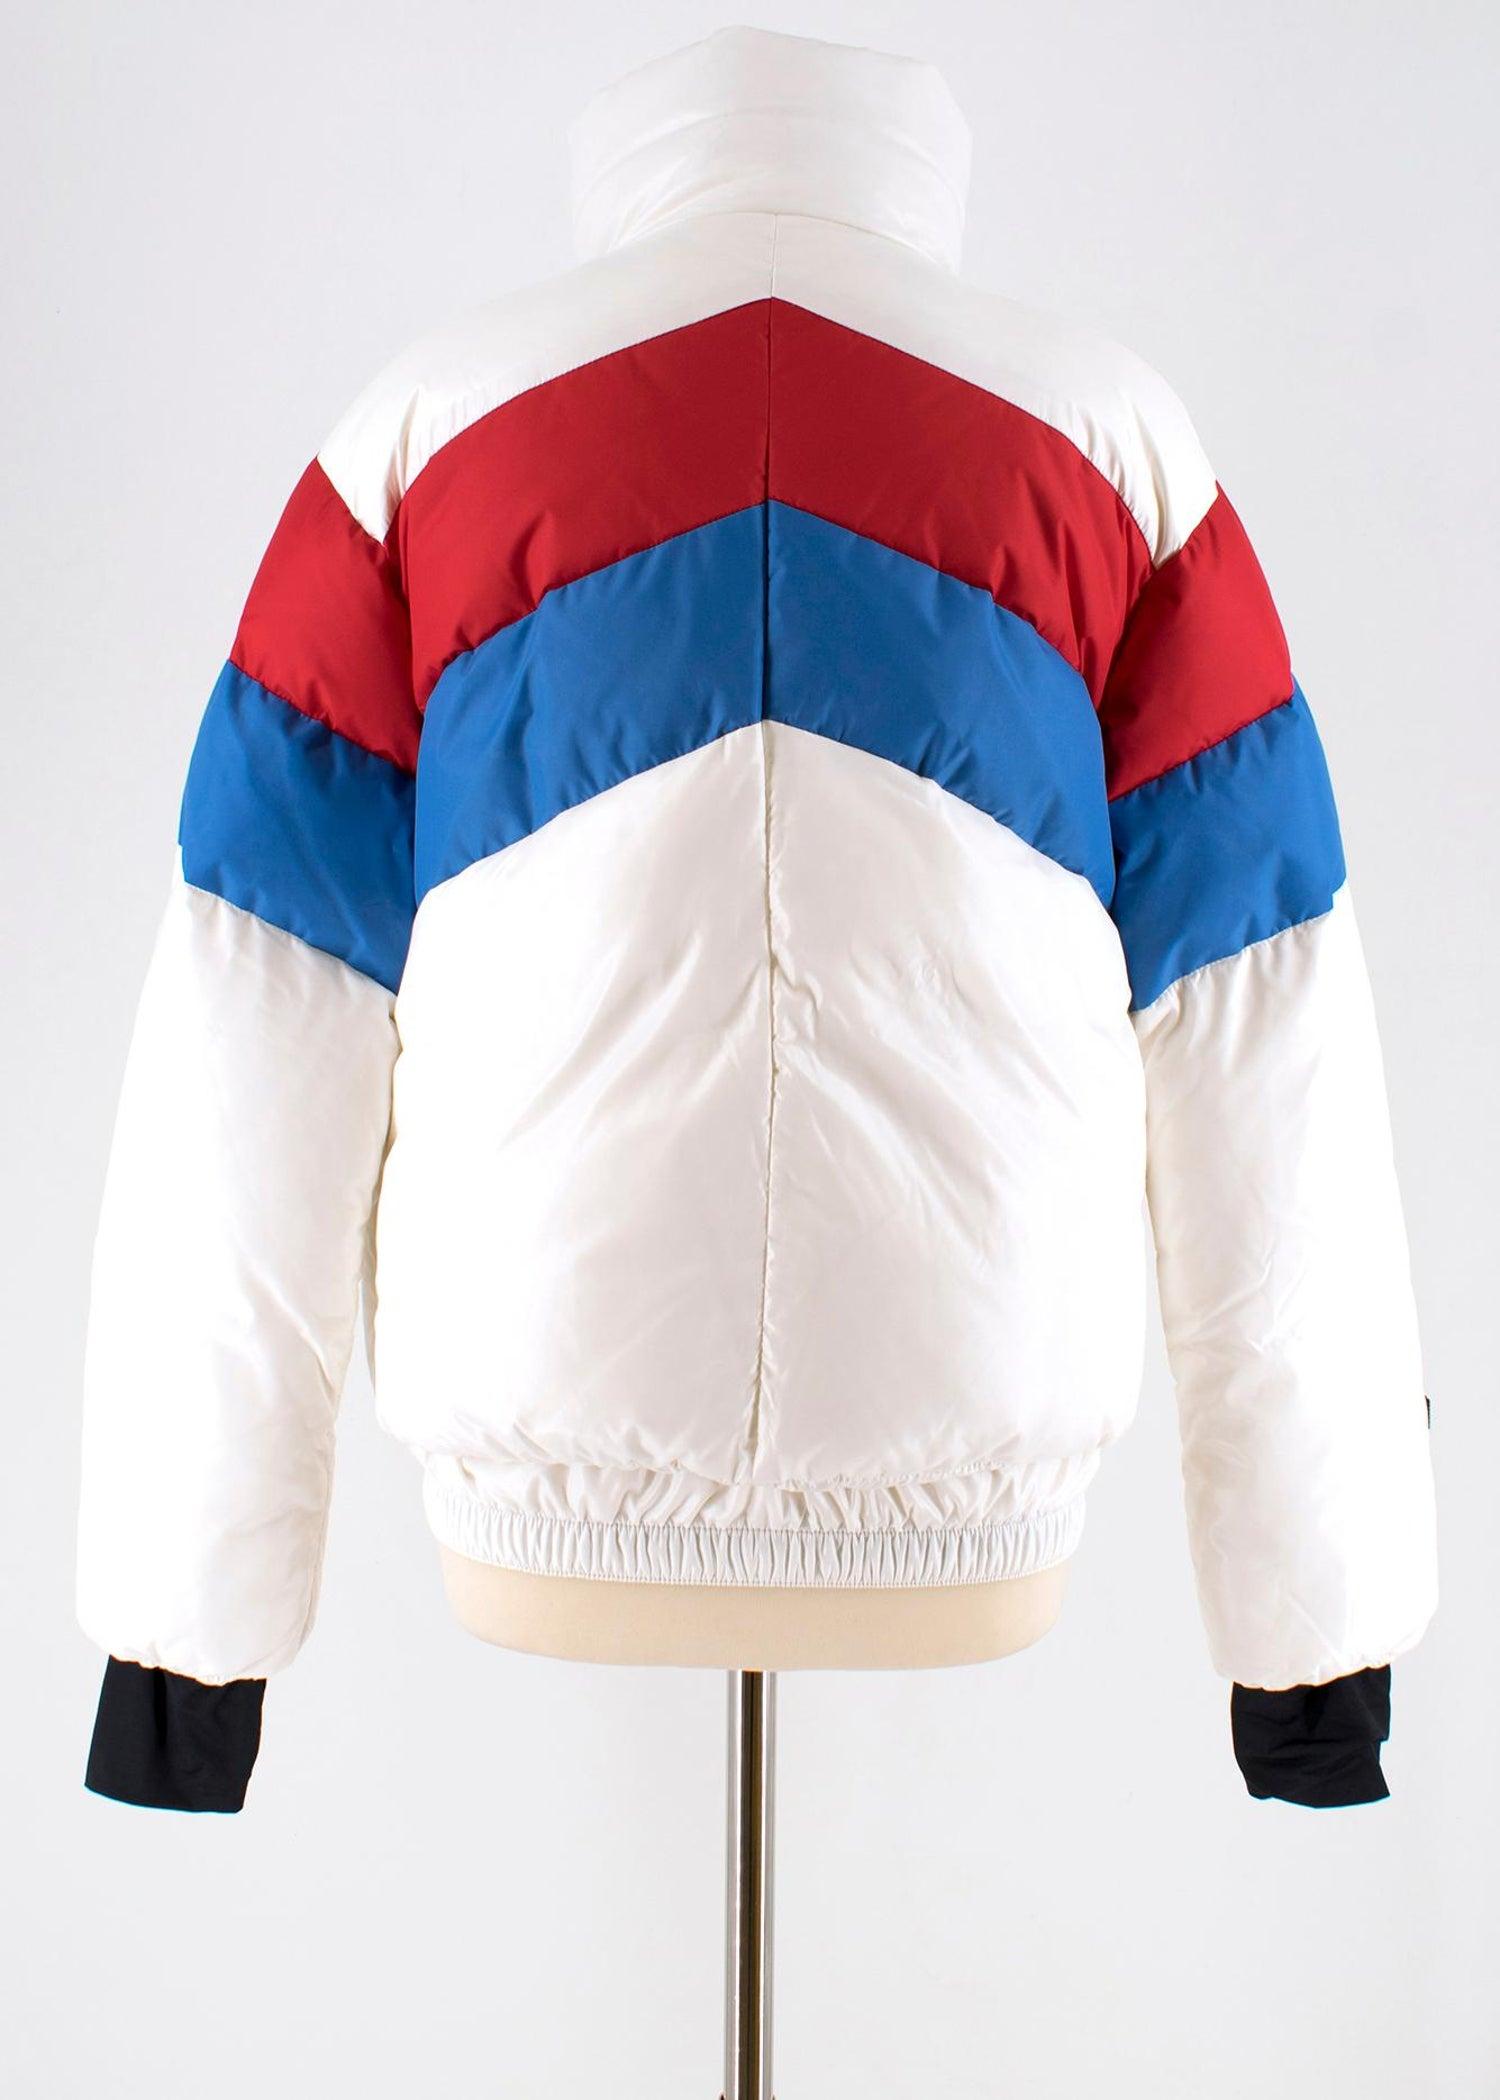 7ed015754 Moncler Lamar Down-Filled Ski Jacket - New Season US 4 (SIZE 0)